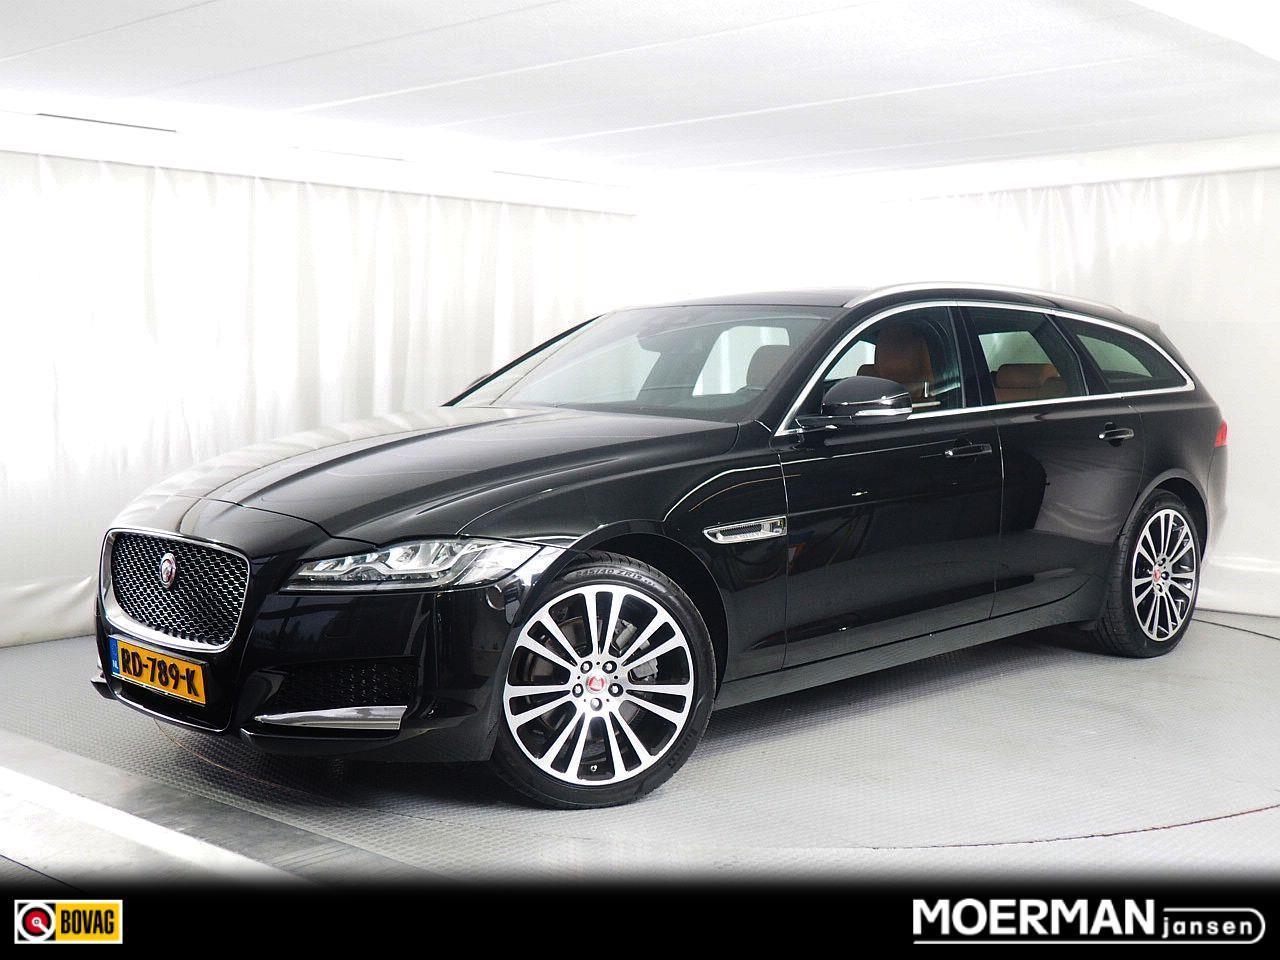 Jaguar Xf Sportbrake 2.0 portfolio luxury / station / navigatie / leder / panoramadak / camera / 250pk